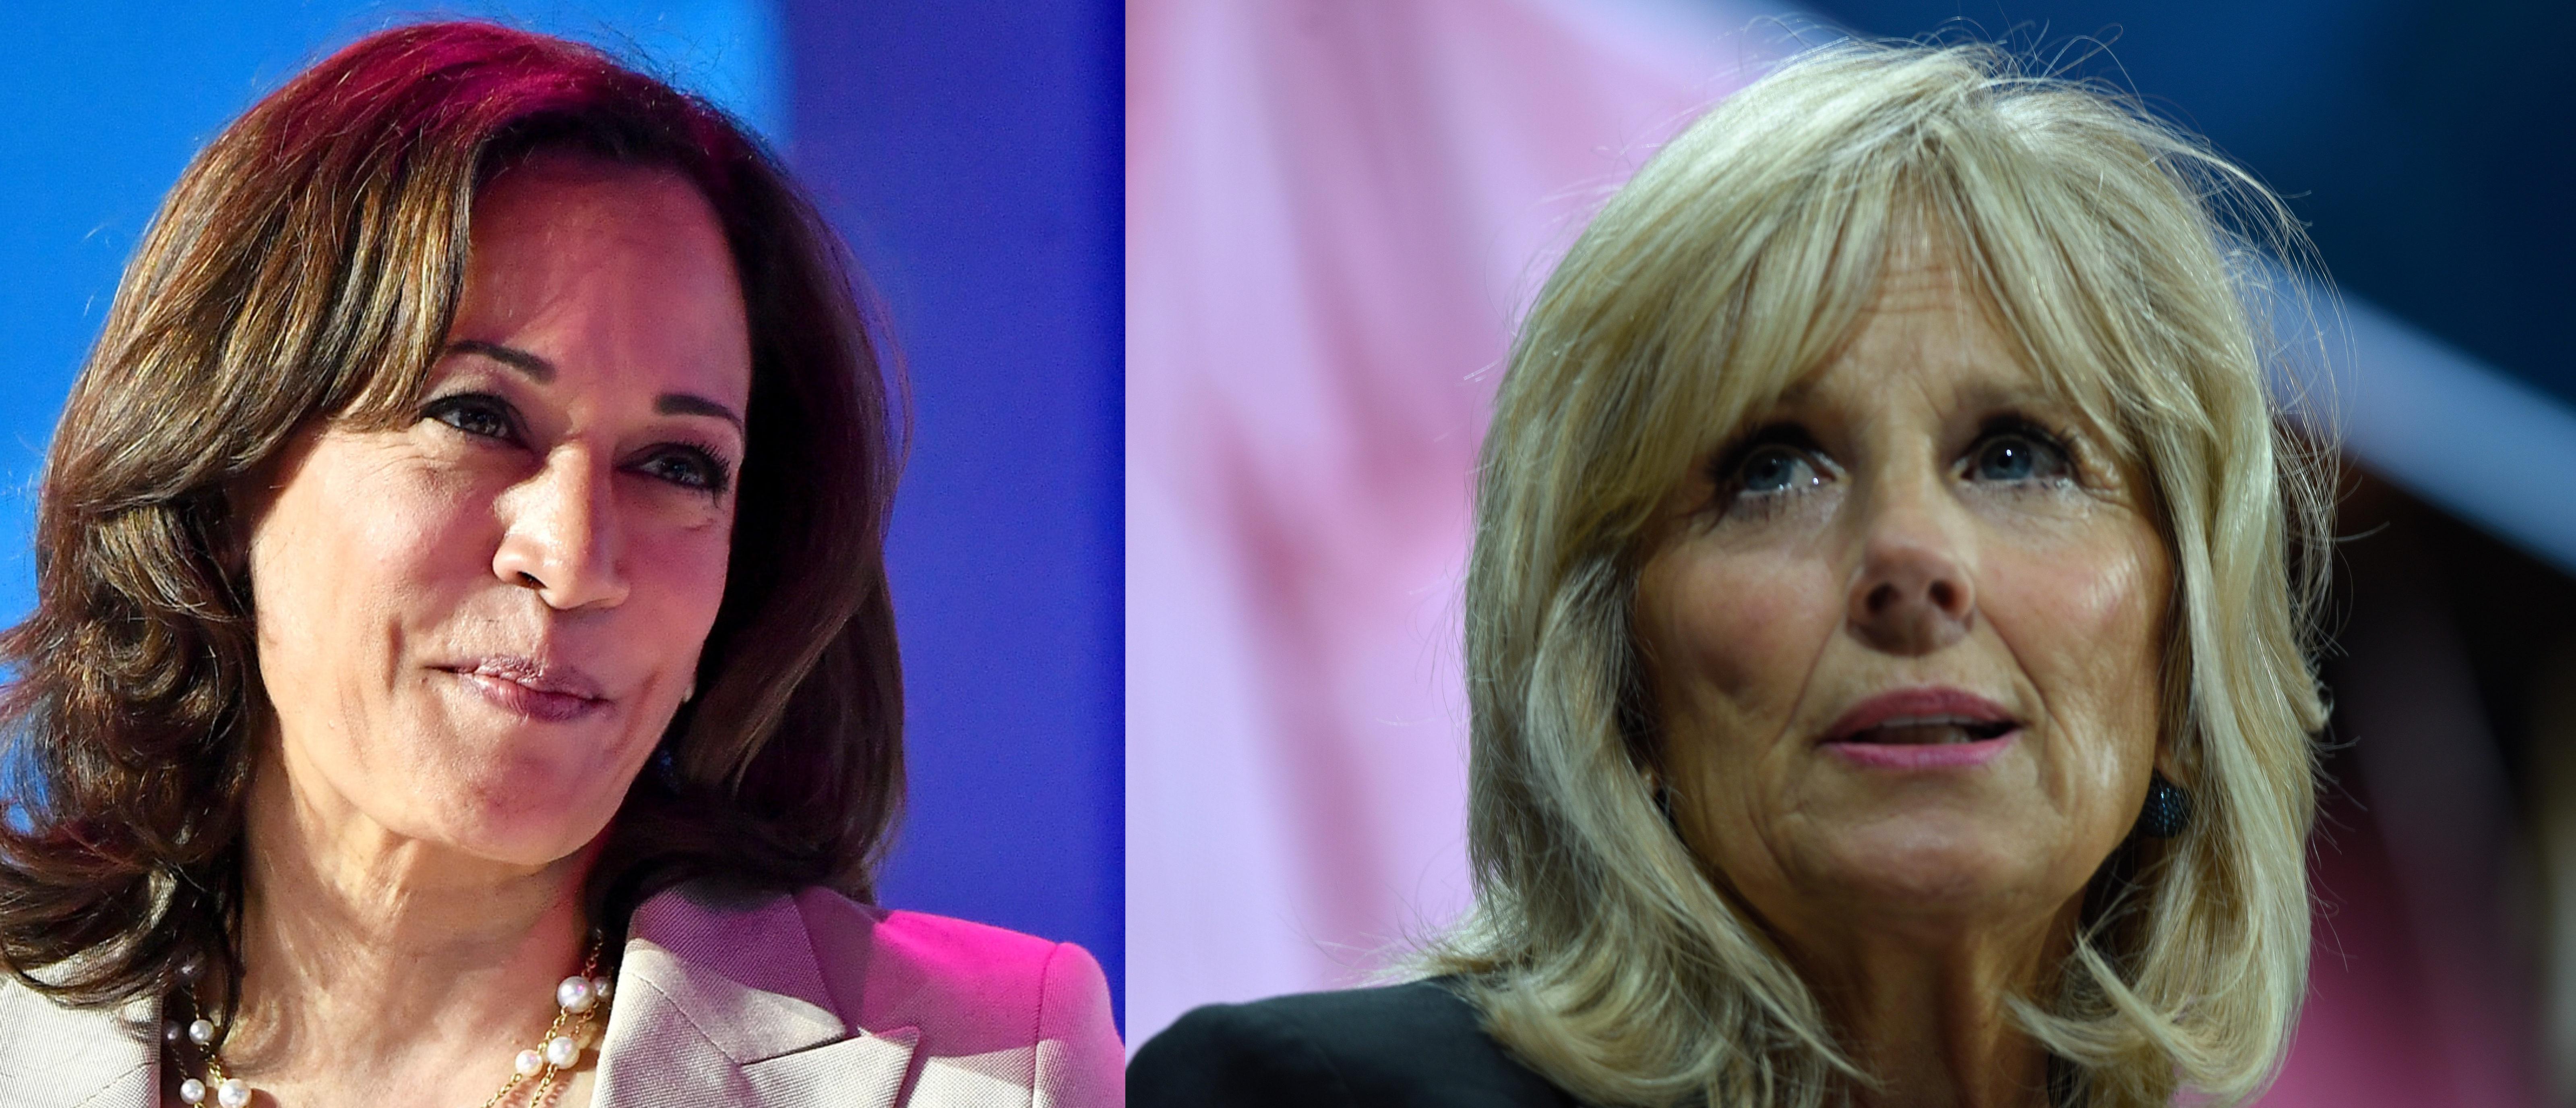 Left: Democratic California Sen. Kamala Harris. Right: Jill Biden, wife of former Vice President Joe Biden (Paras Griffin/Getty Images for ESSENCE; Riccardo Savi/Getty Images for Concordia Summit)